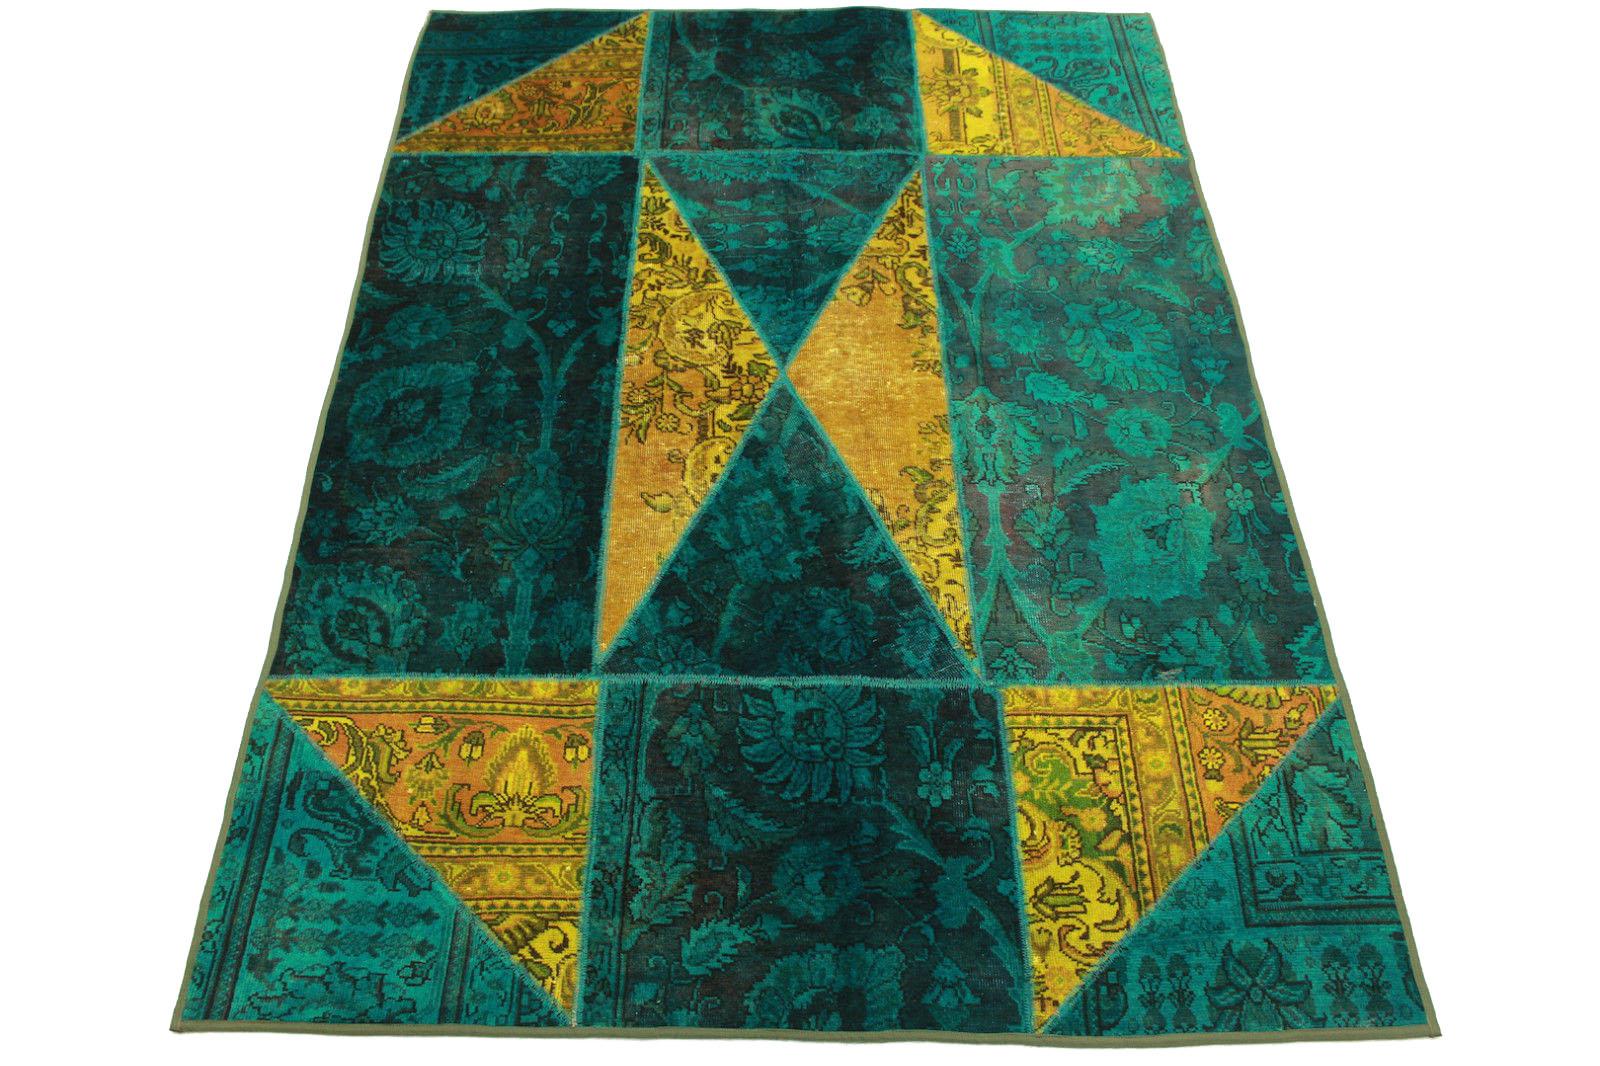 patchwork teppich t rkis curry in 240x170cm 1001 1438 bei kaufen. Black Bedroom Furniture Sets. Home Design Ideas